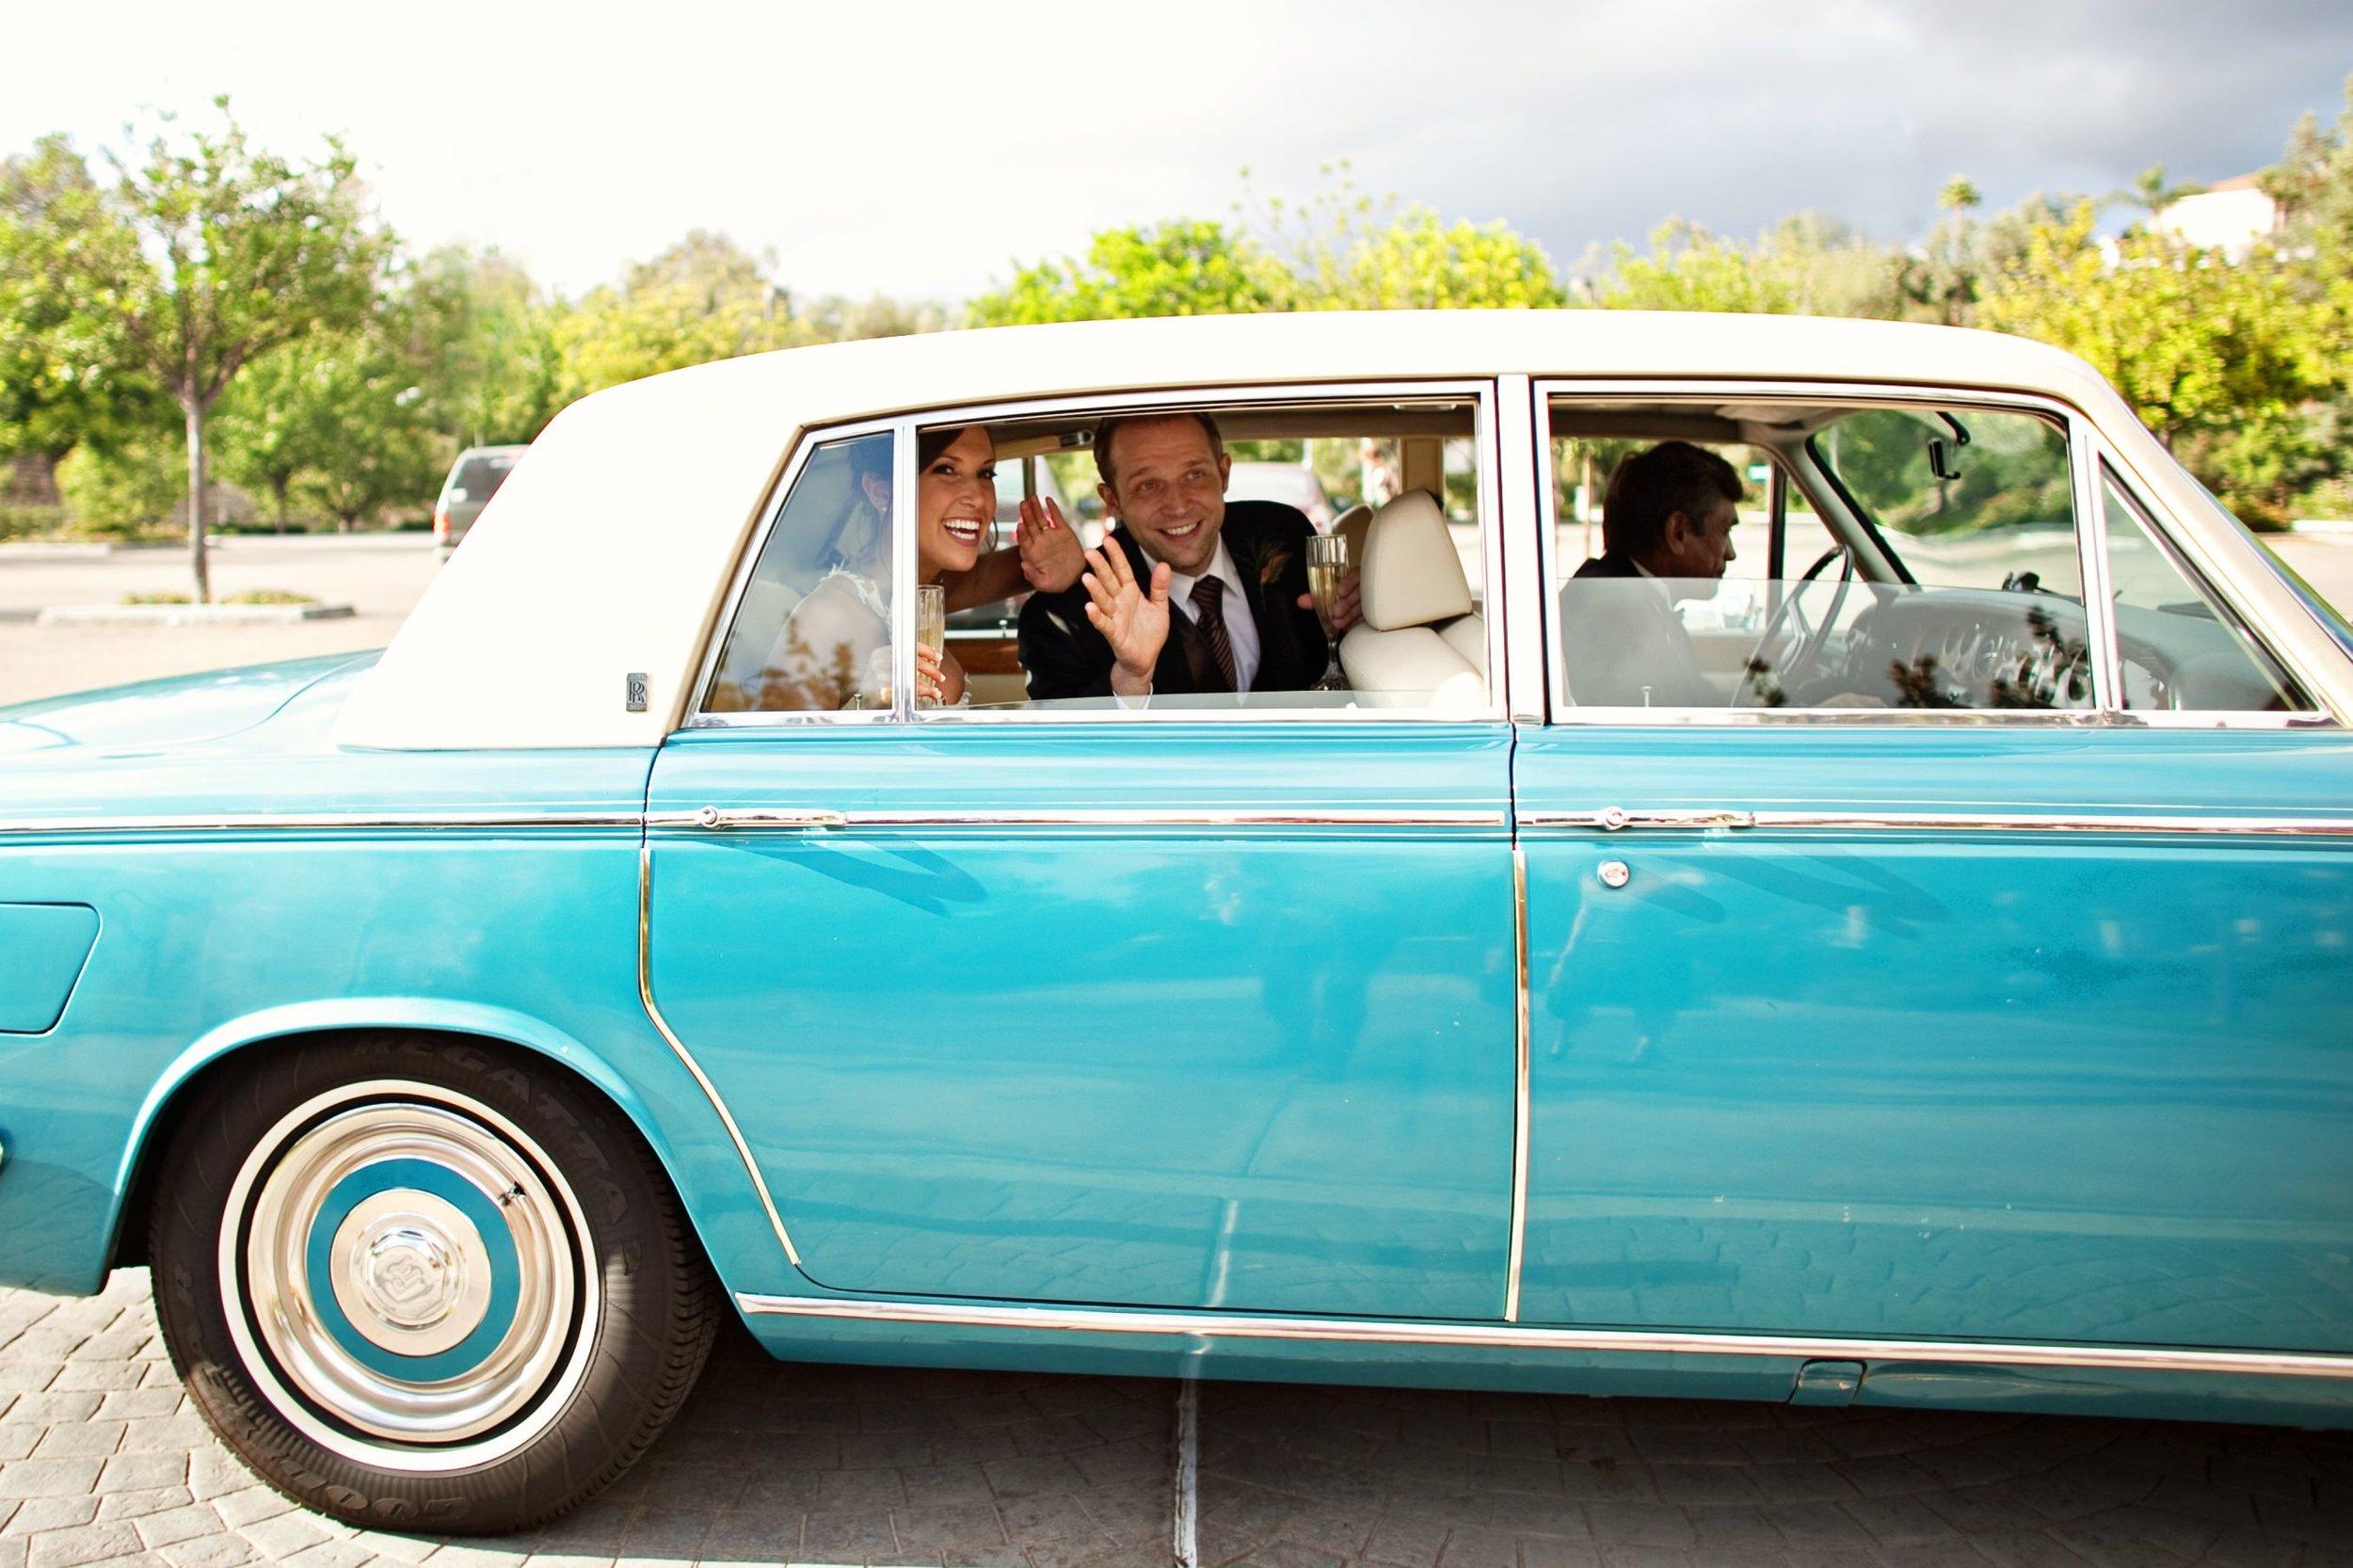 eephoto.eric.aubrey.wedding-57.jpg